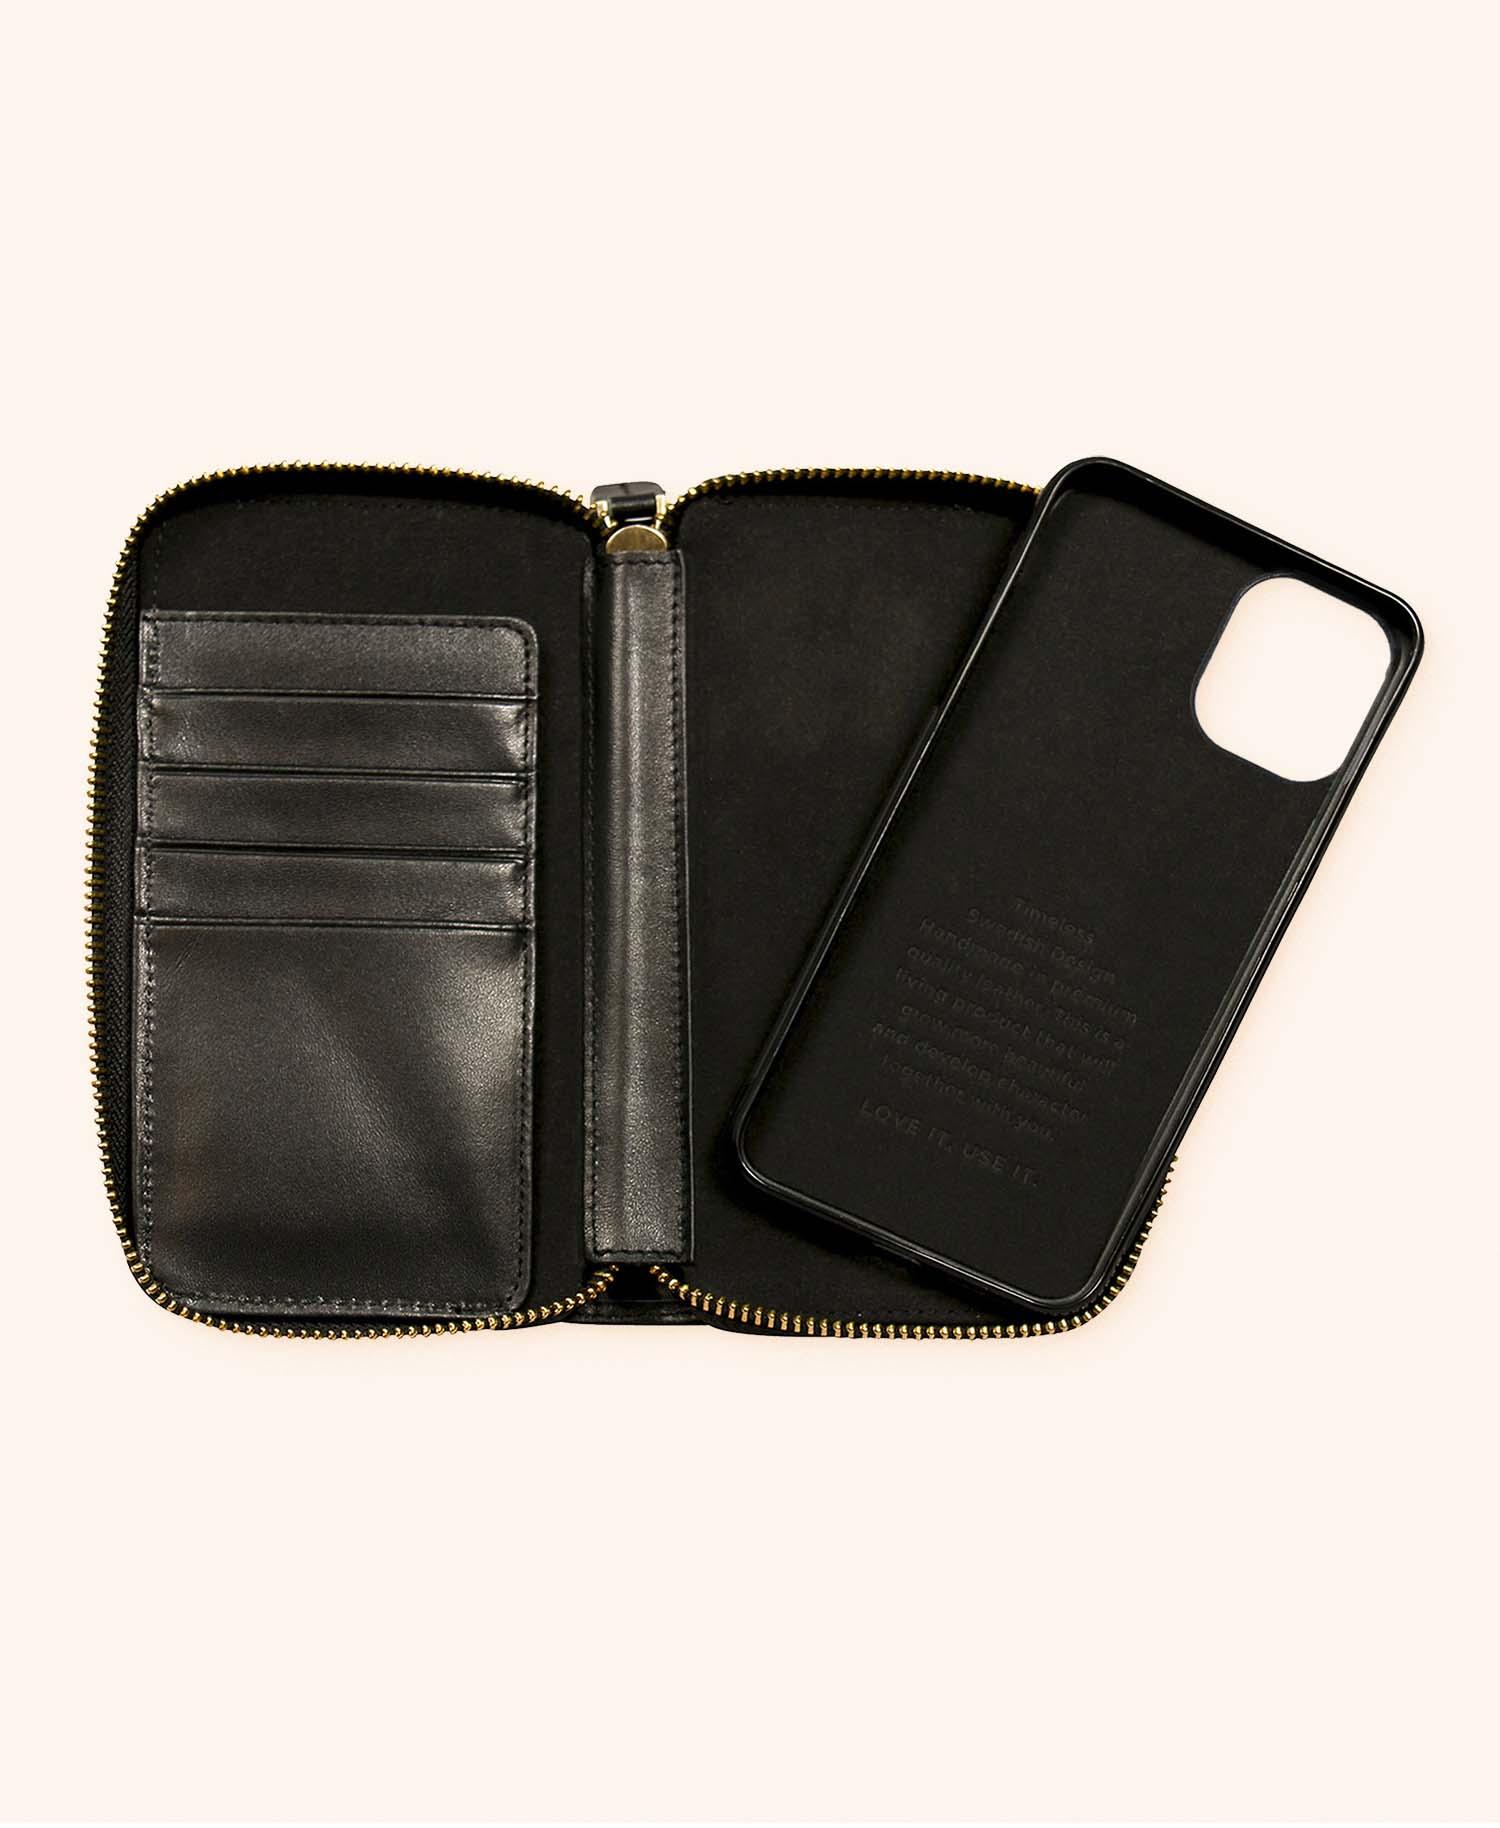 Greg black wallet iphone 11 - inside